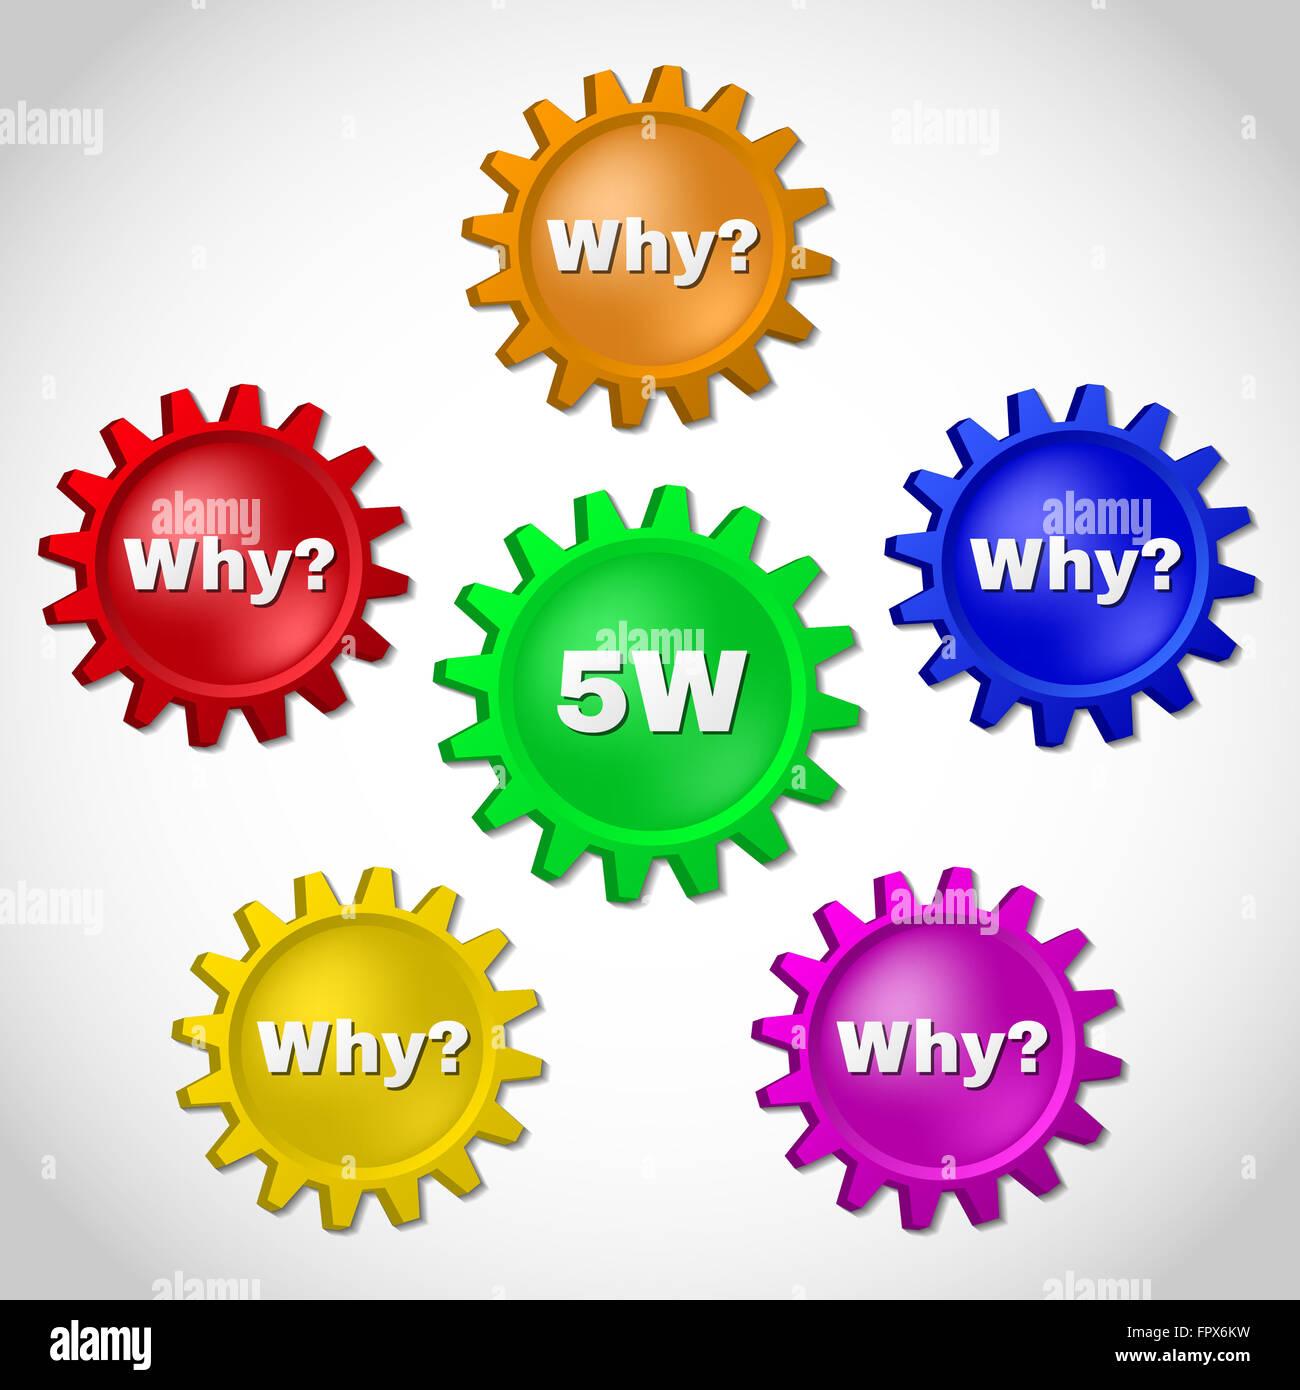 5w Root Causeysis Methodology Concept 5 Whys